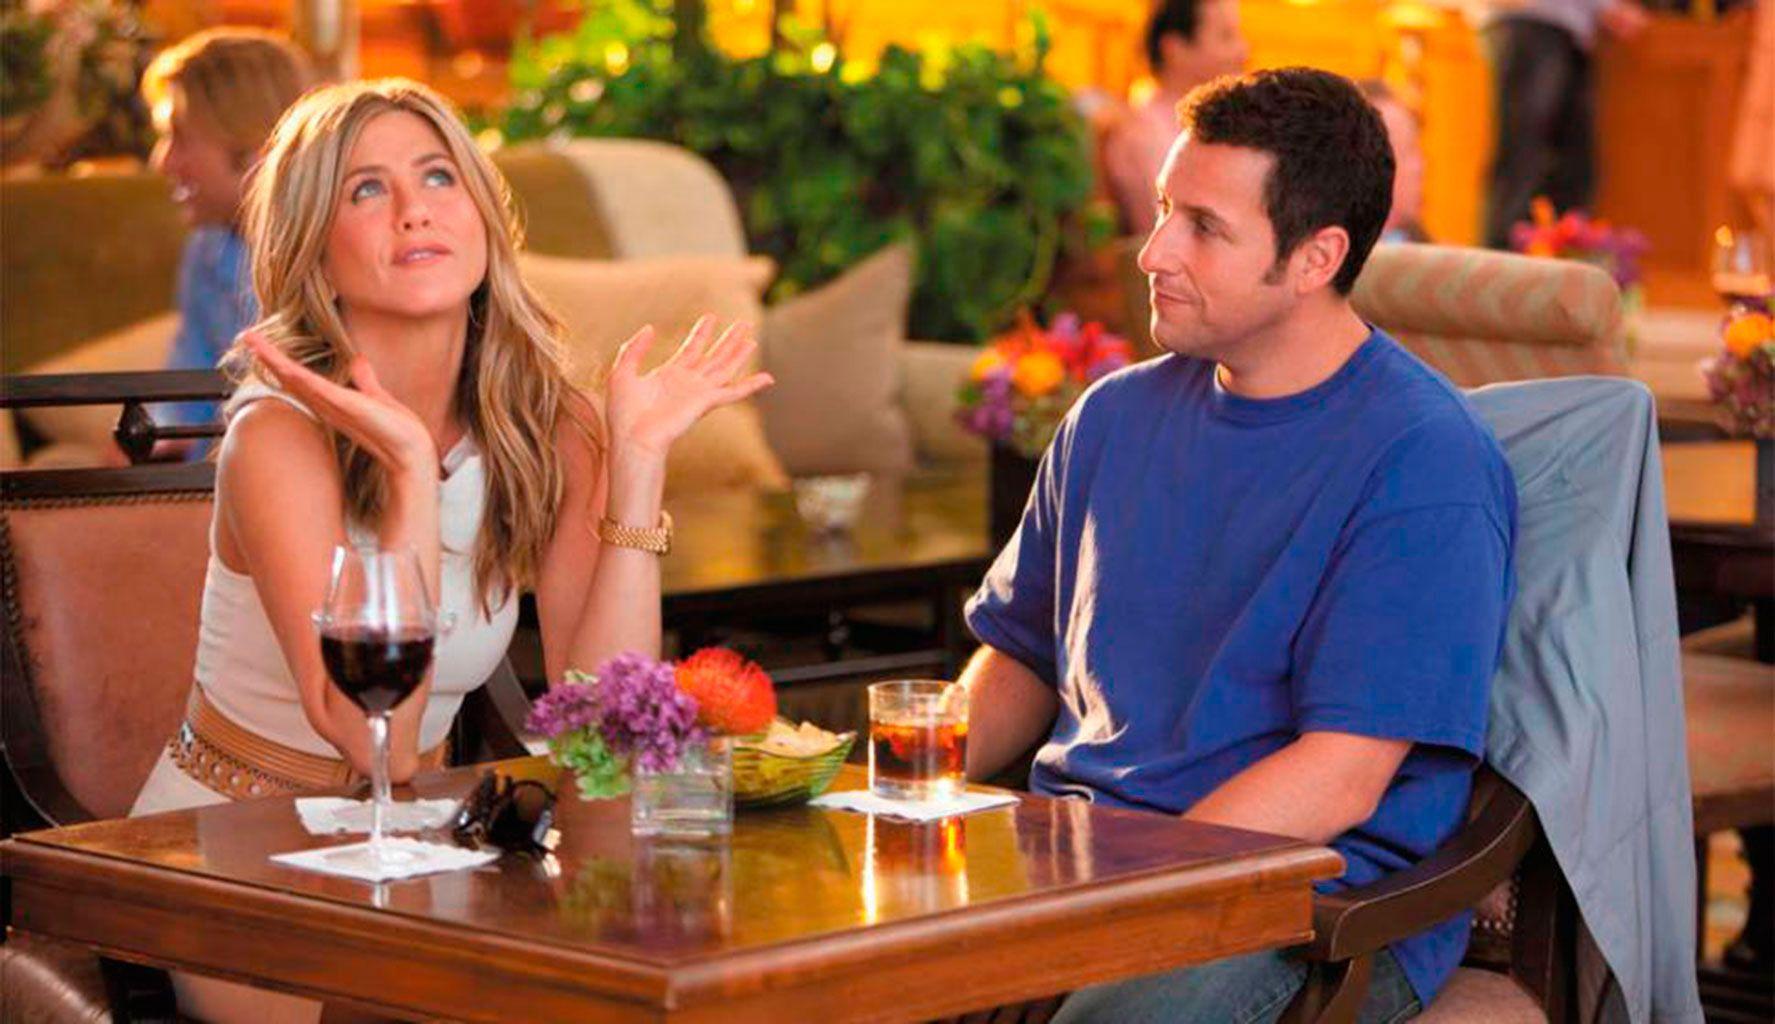 Sígueme el rollo', con Jennifer Aniston